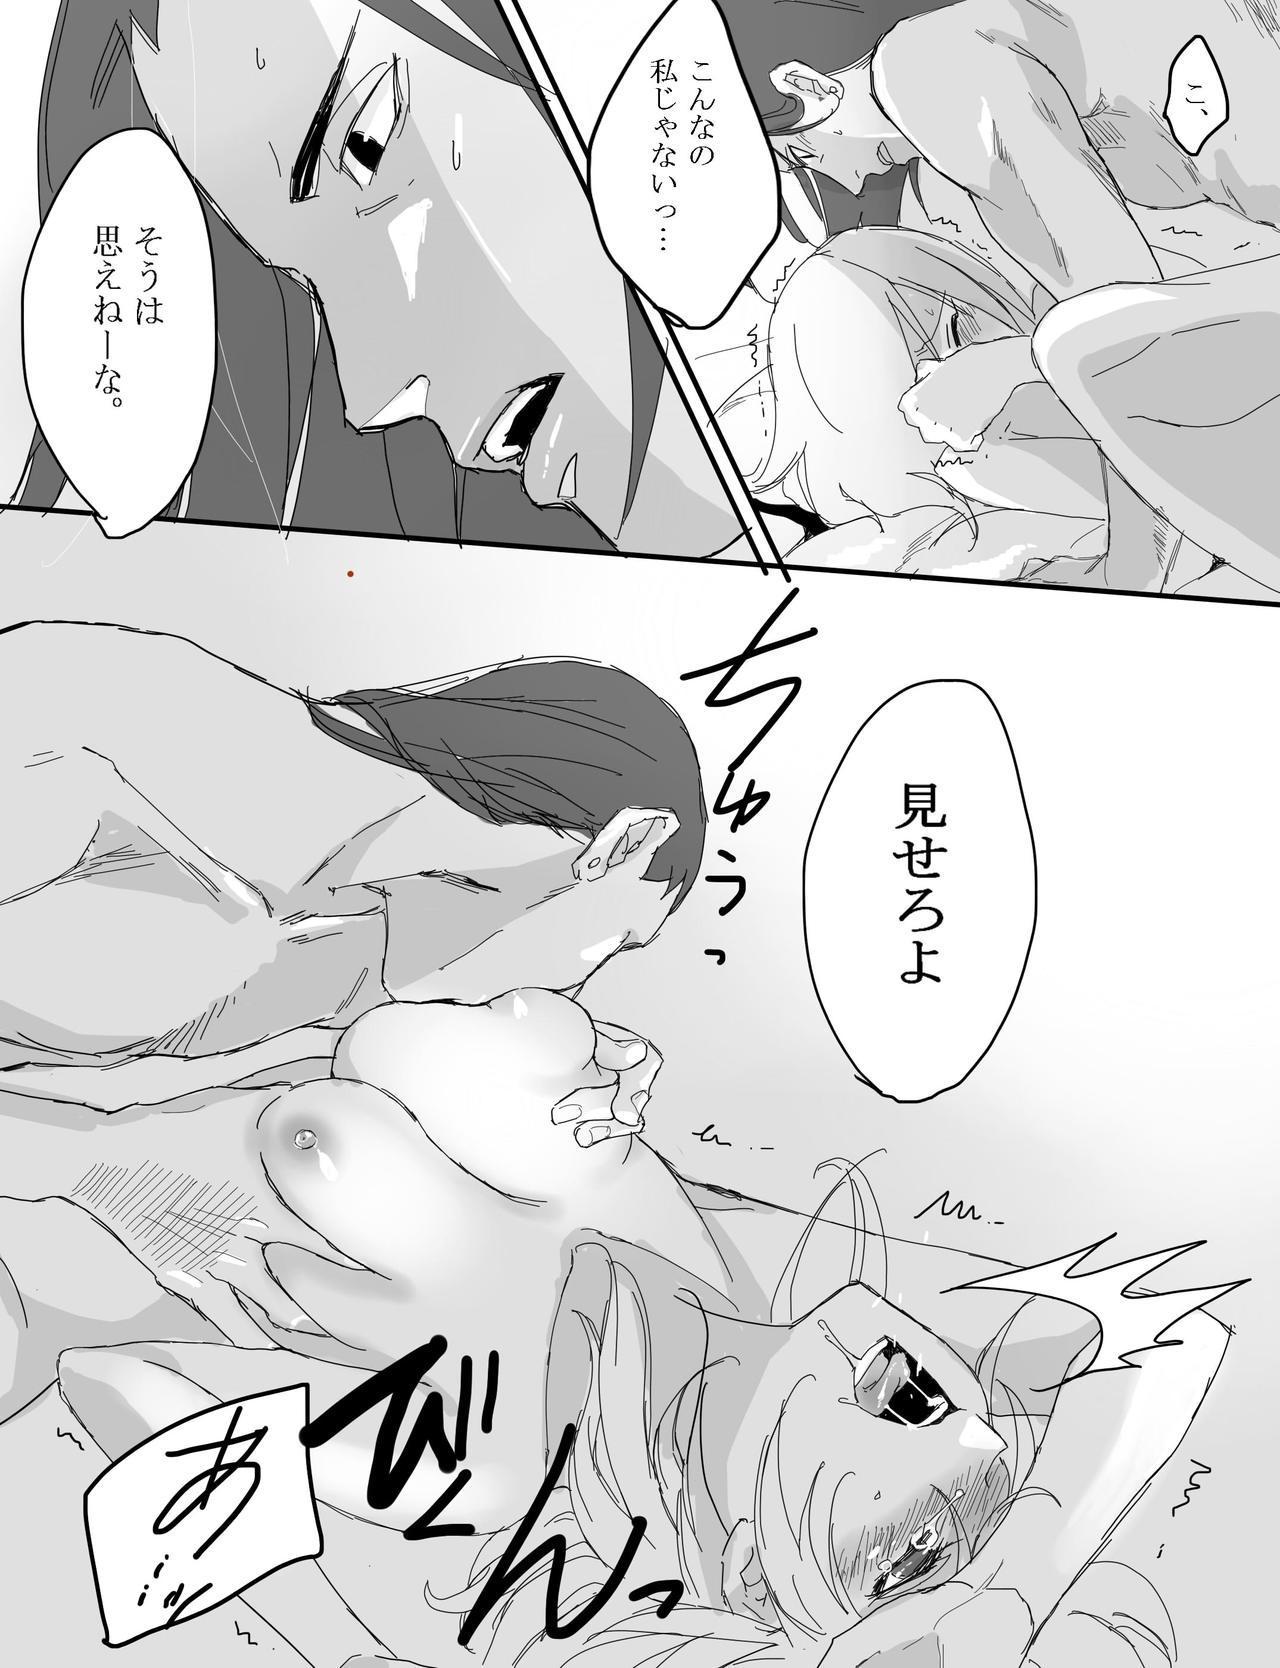 Shikamaru 's birthday celebration! - ShikaTema R18 doujinshi 4